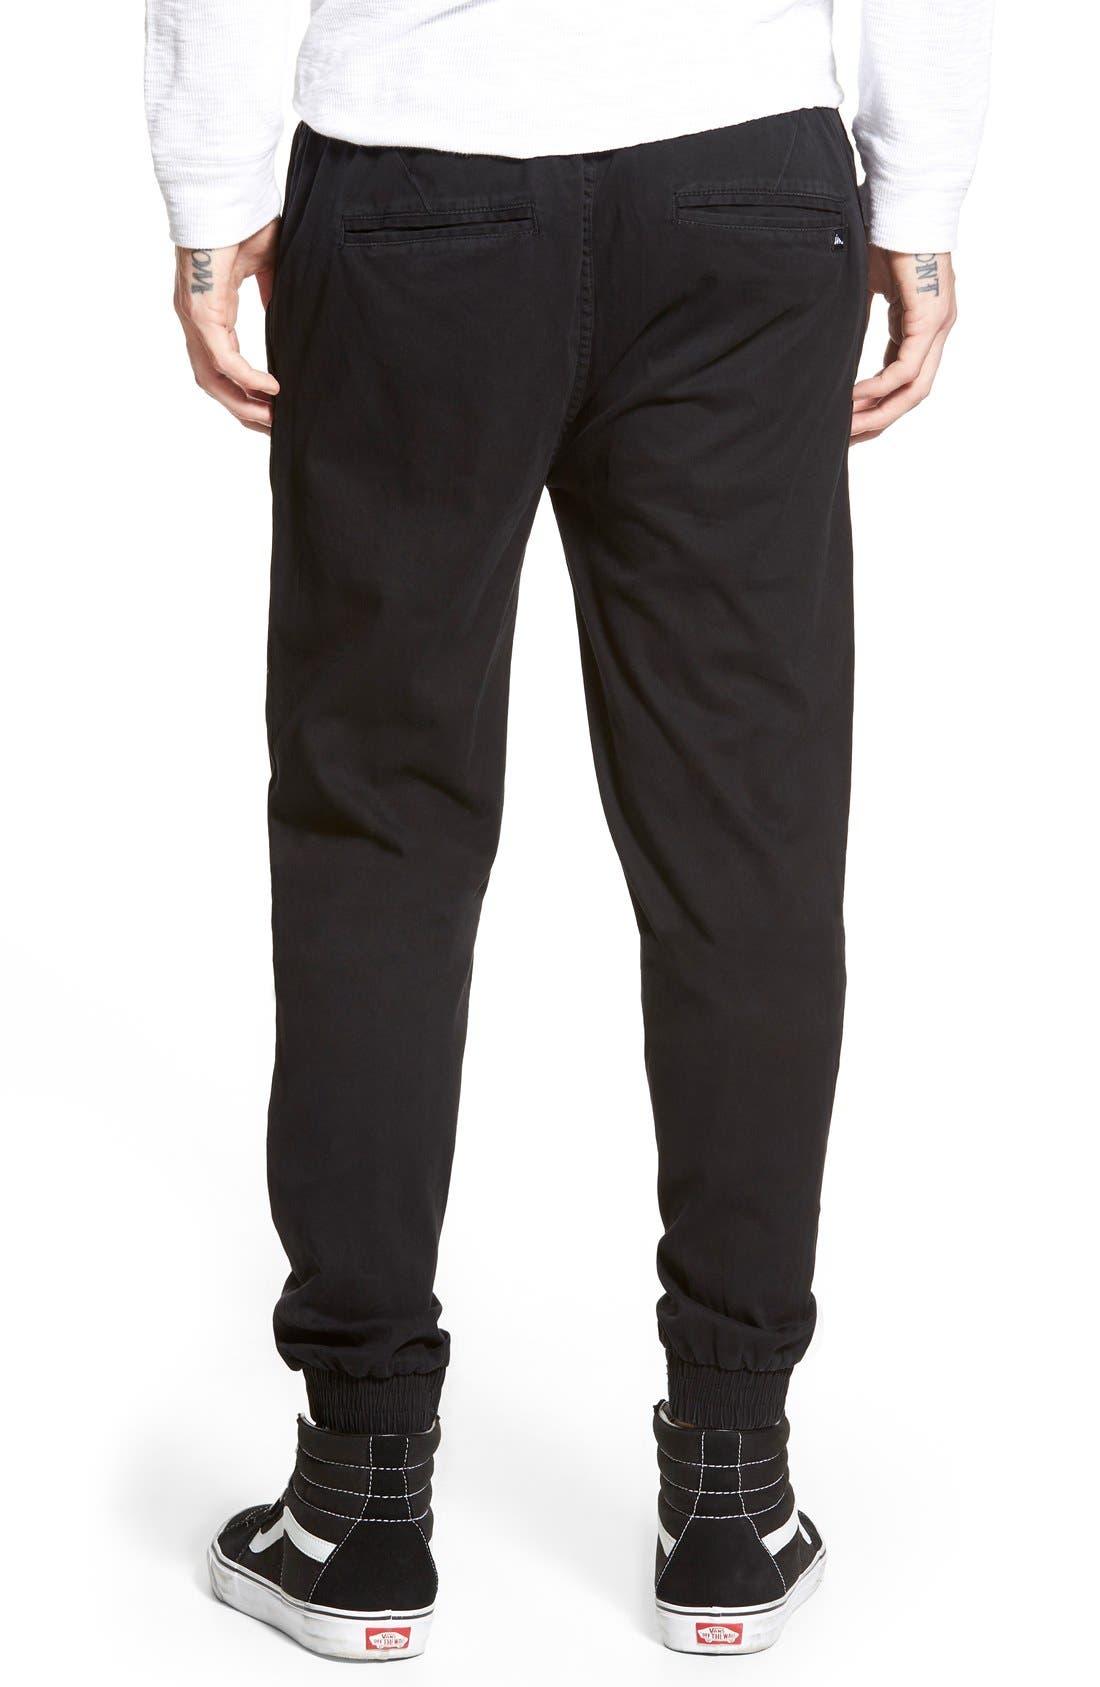 'Denny' Woven Jogger Pants,                             Alternate thumbnail 3, color,                             001